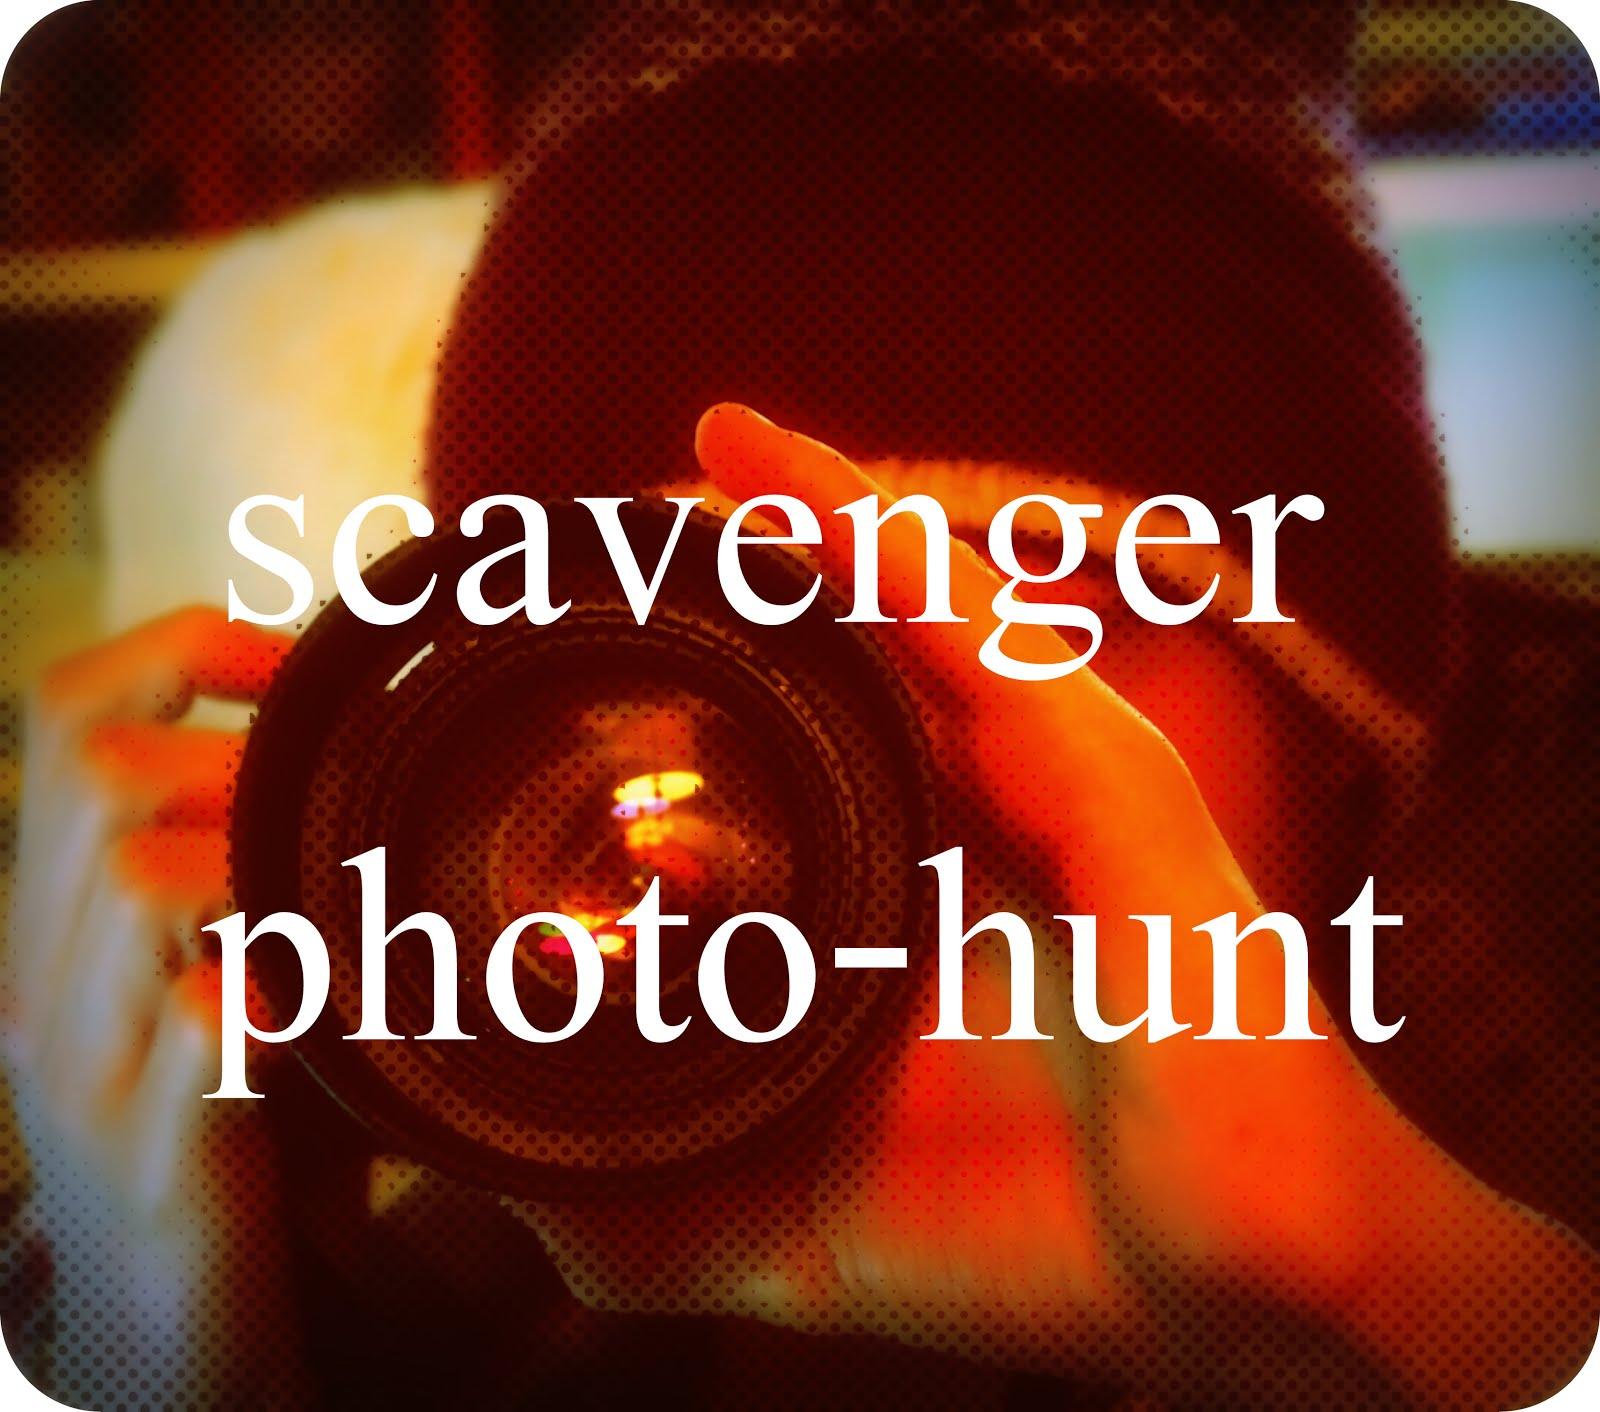 Scavenger photo-hunt